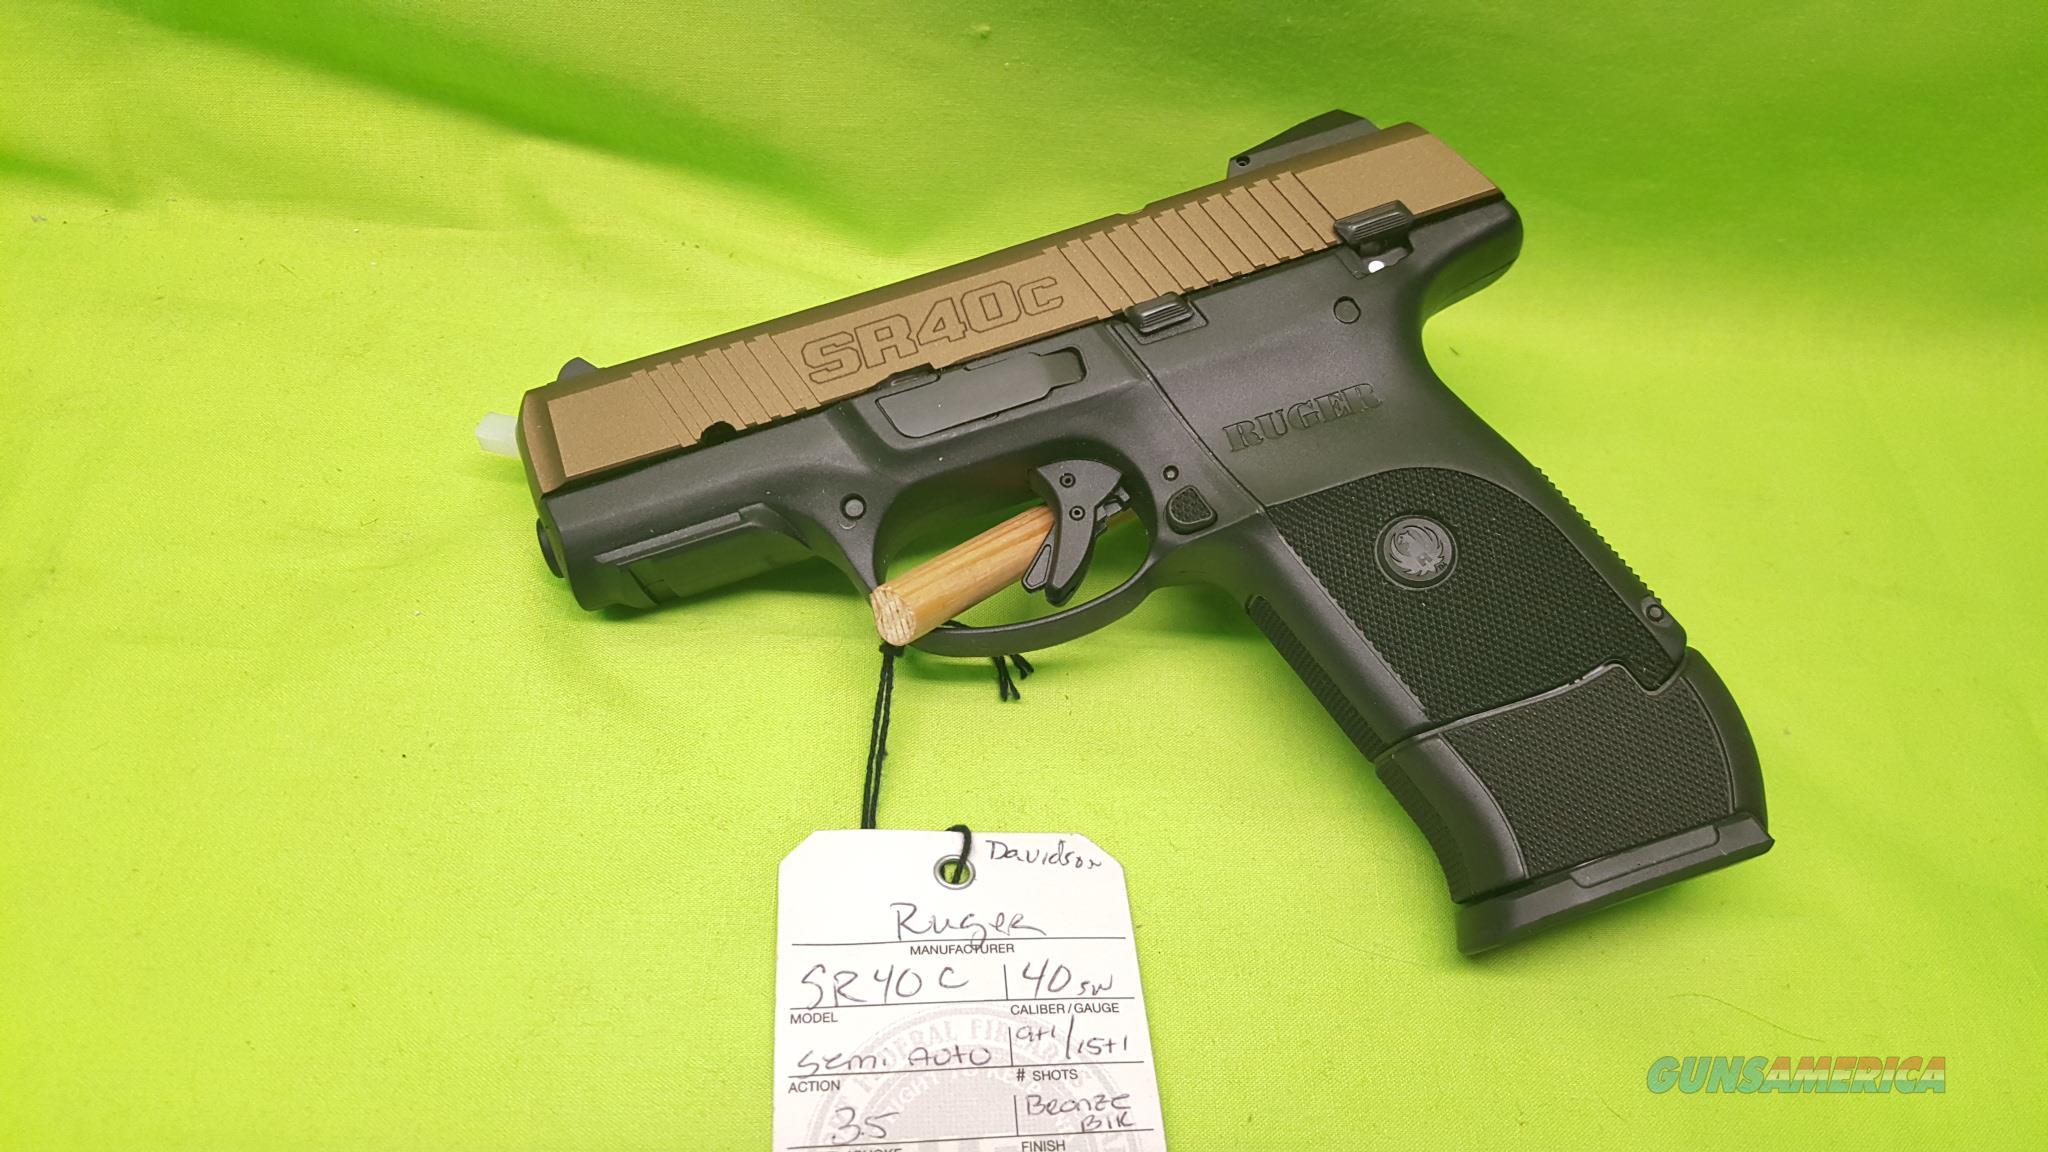 Ruger SR40C SR 40 C S&W 40S&W 9/15 BRONZE BLK 3483  Guns > Pistols > Ruger Semi-Auto Pistols > SR Family > SR40C